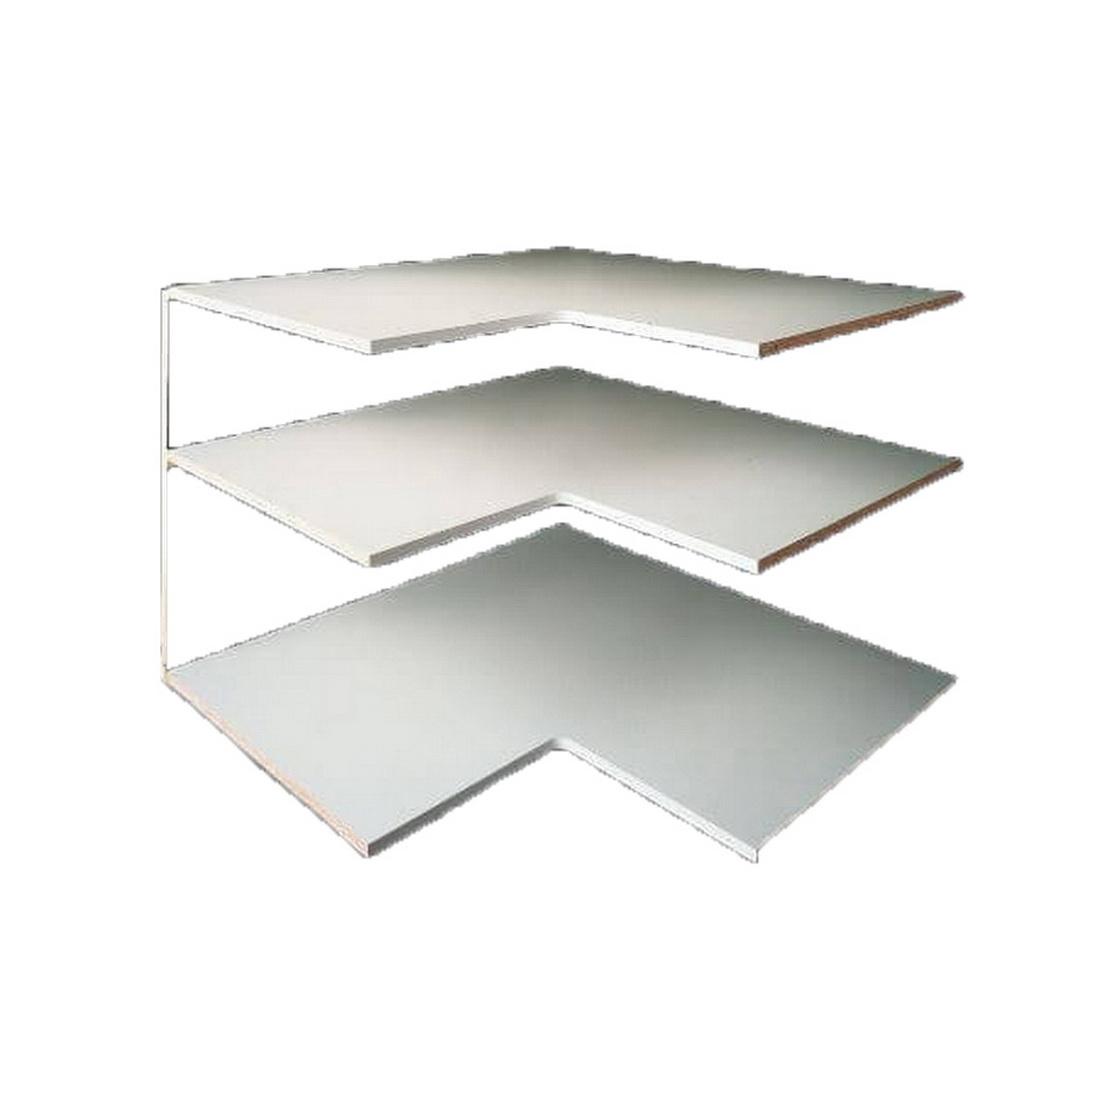 Laminex Whiteboard MDF Panel 2440 x 1220 x 18mm Gloss 872501